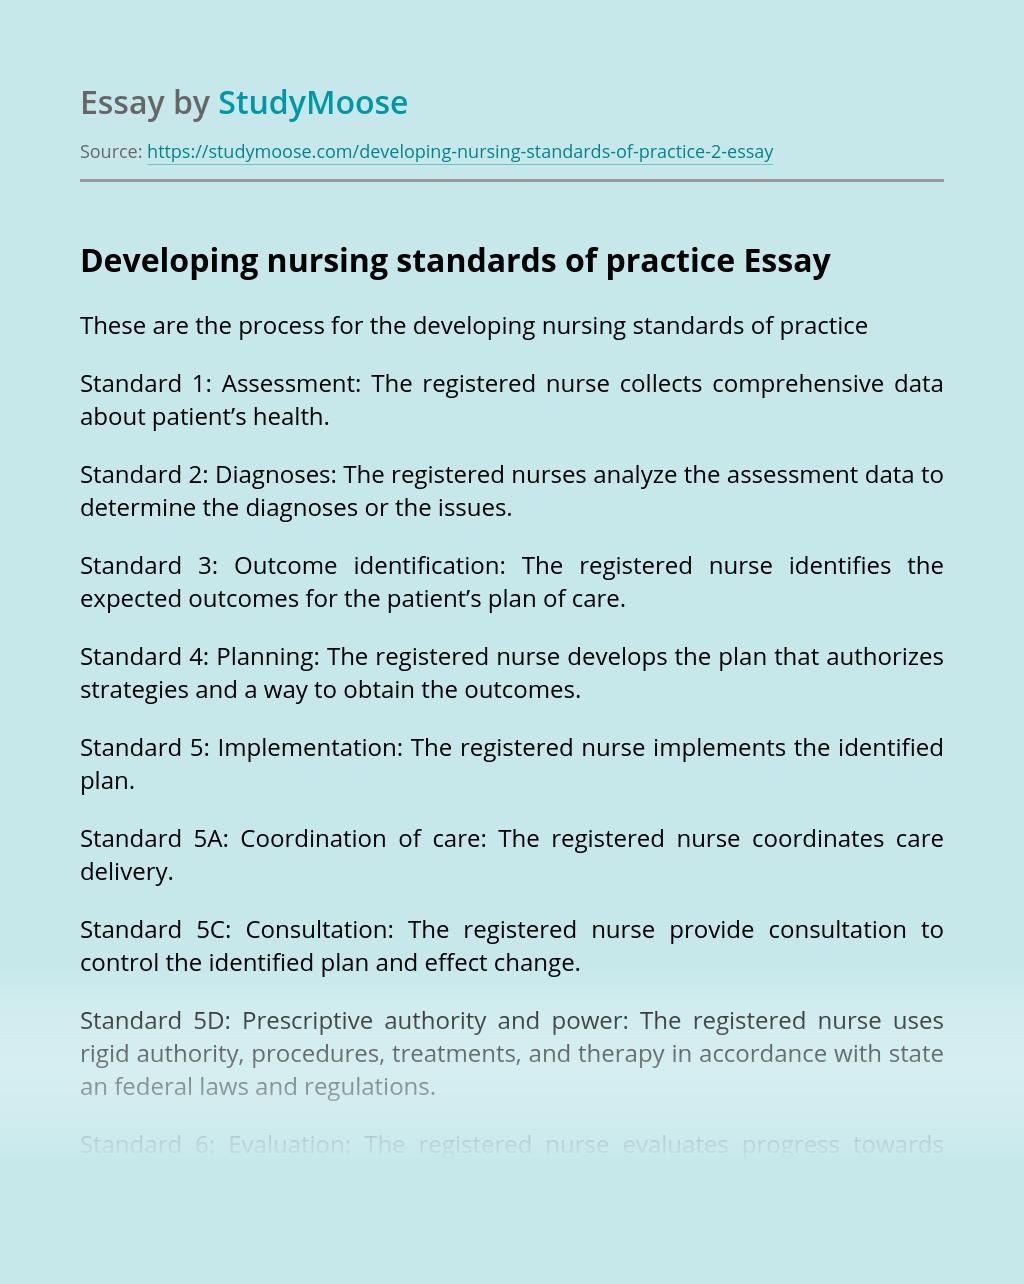 Developing nursing standards of practice